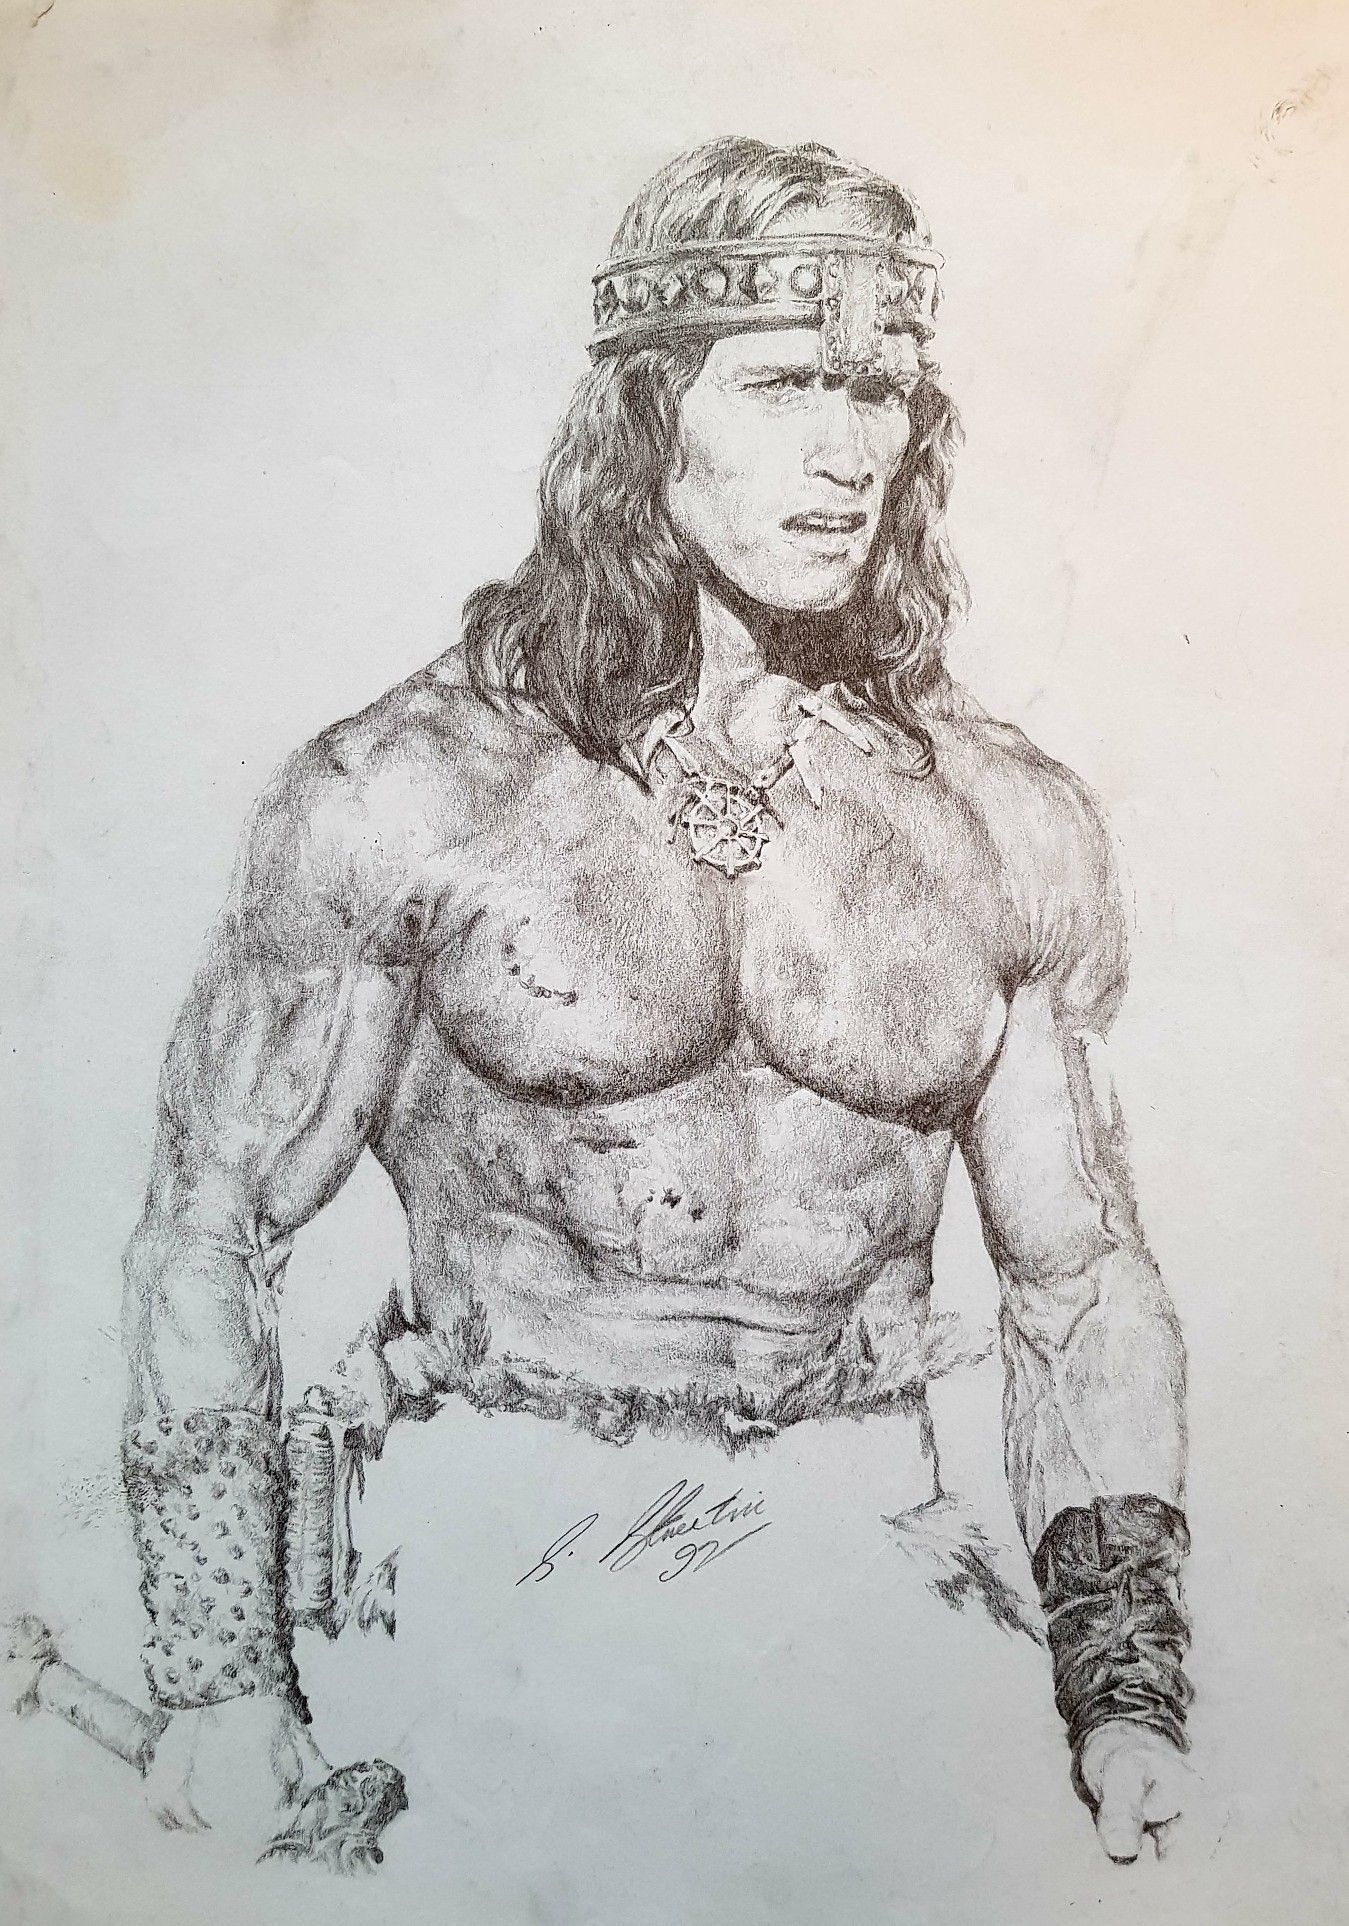 Arnold Schwarzenegger In Pencil By Steven Streetin Celebrity Art Drawings Movie Character Sketch Pencil Drawings